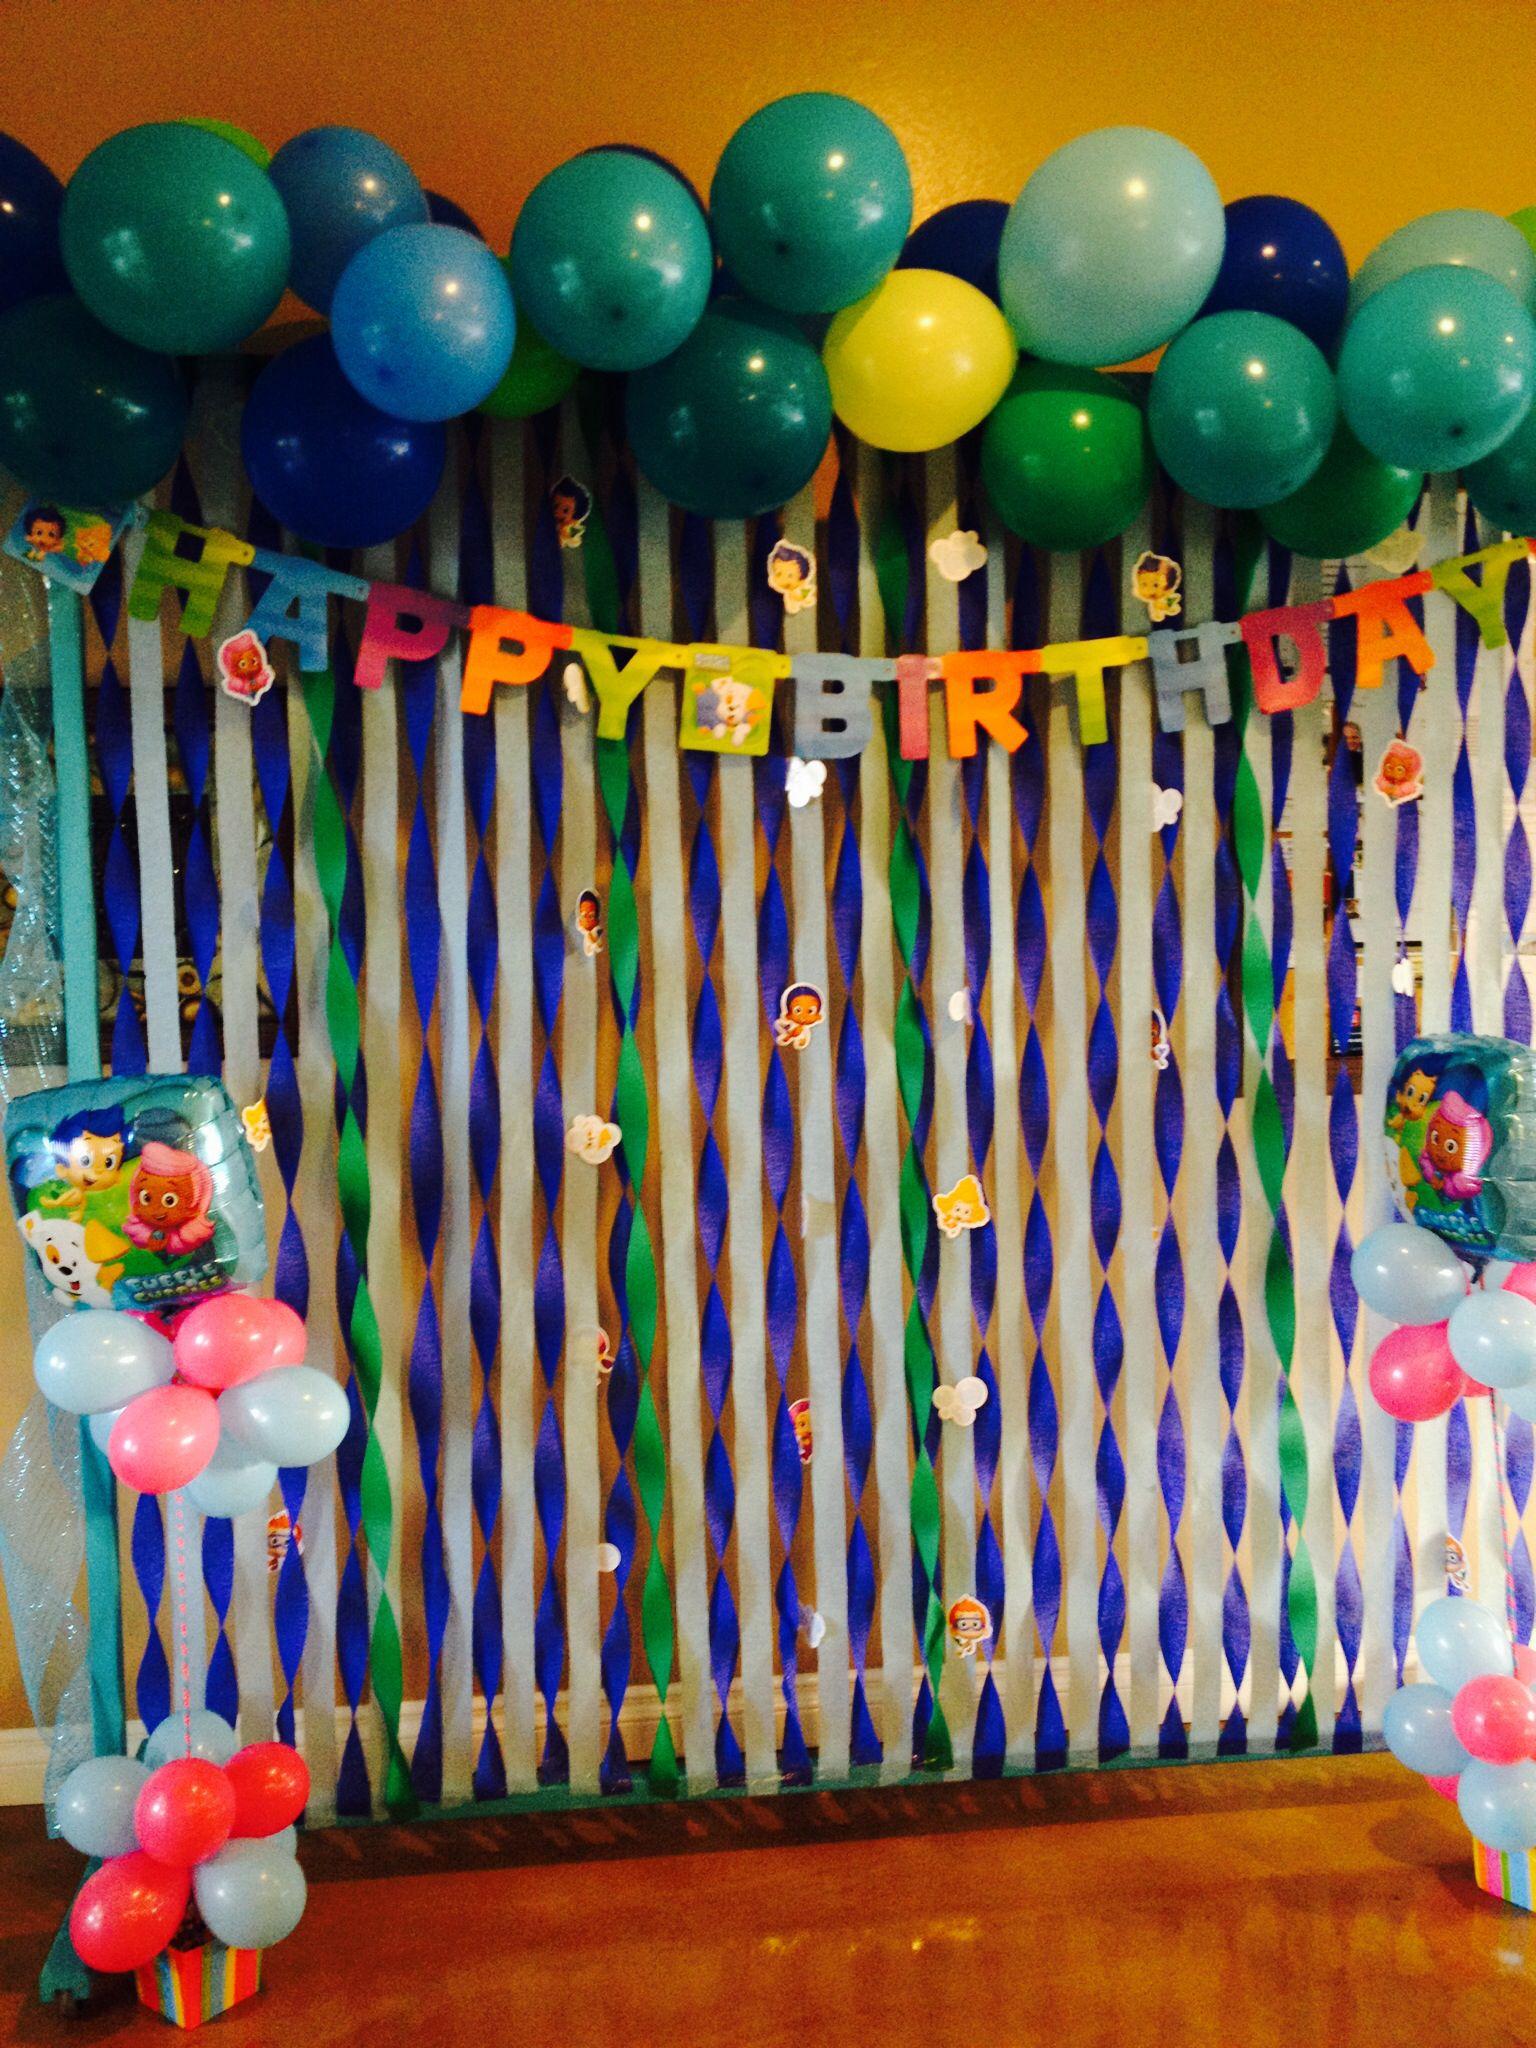 Bubble guppies decoration birthday pinterest bubble guppies decorations bubble guppies - Bubble guppies party favors ideas ...